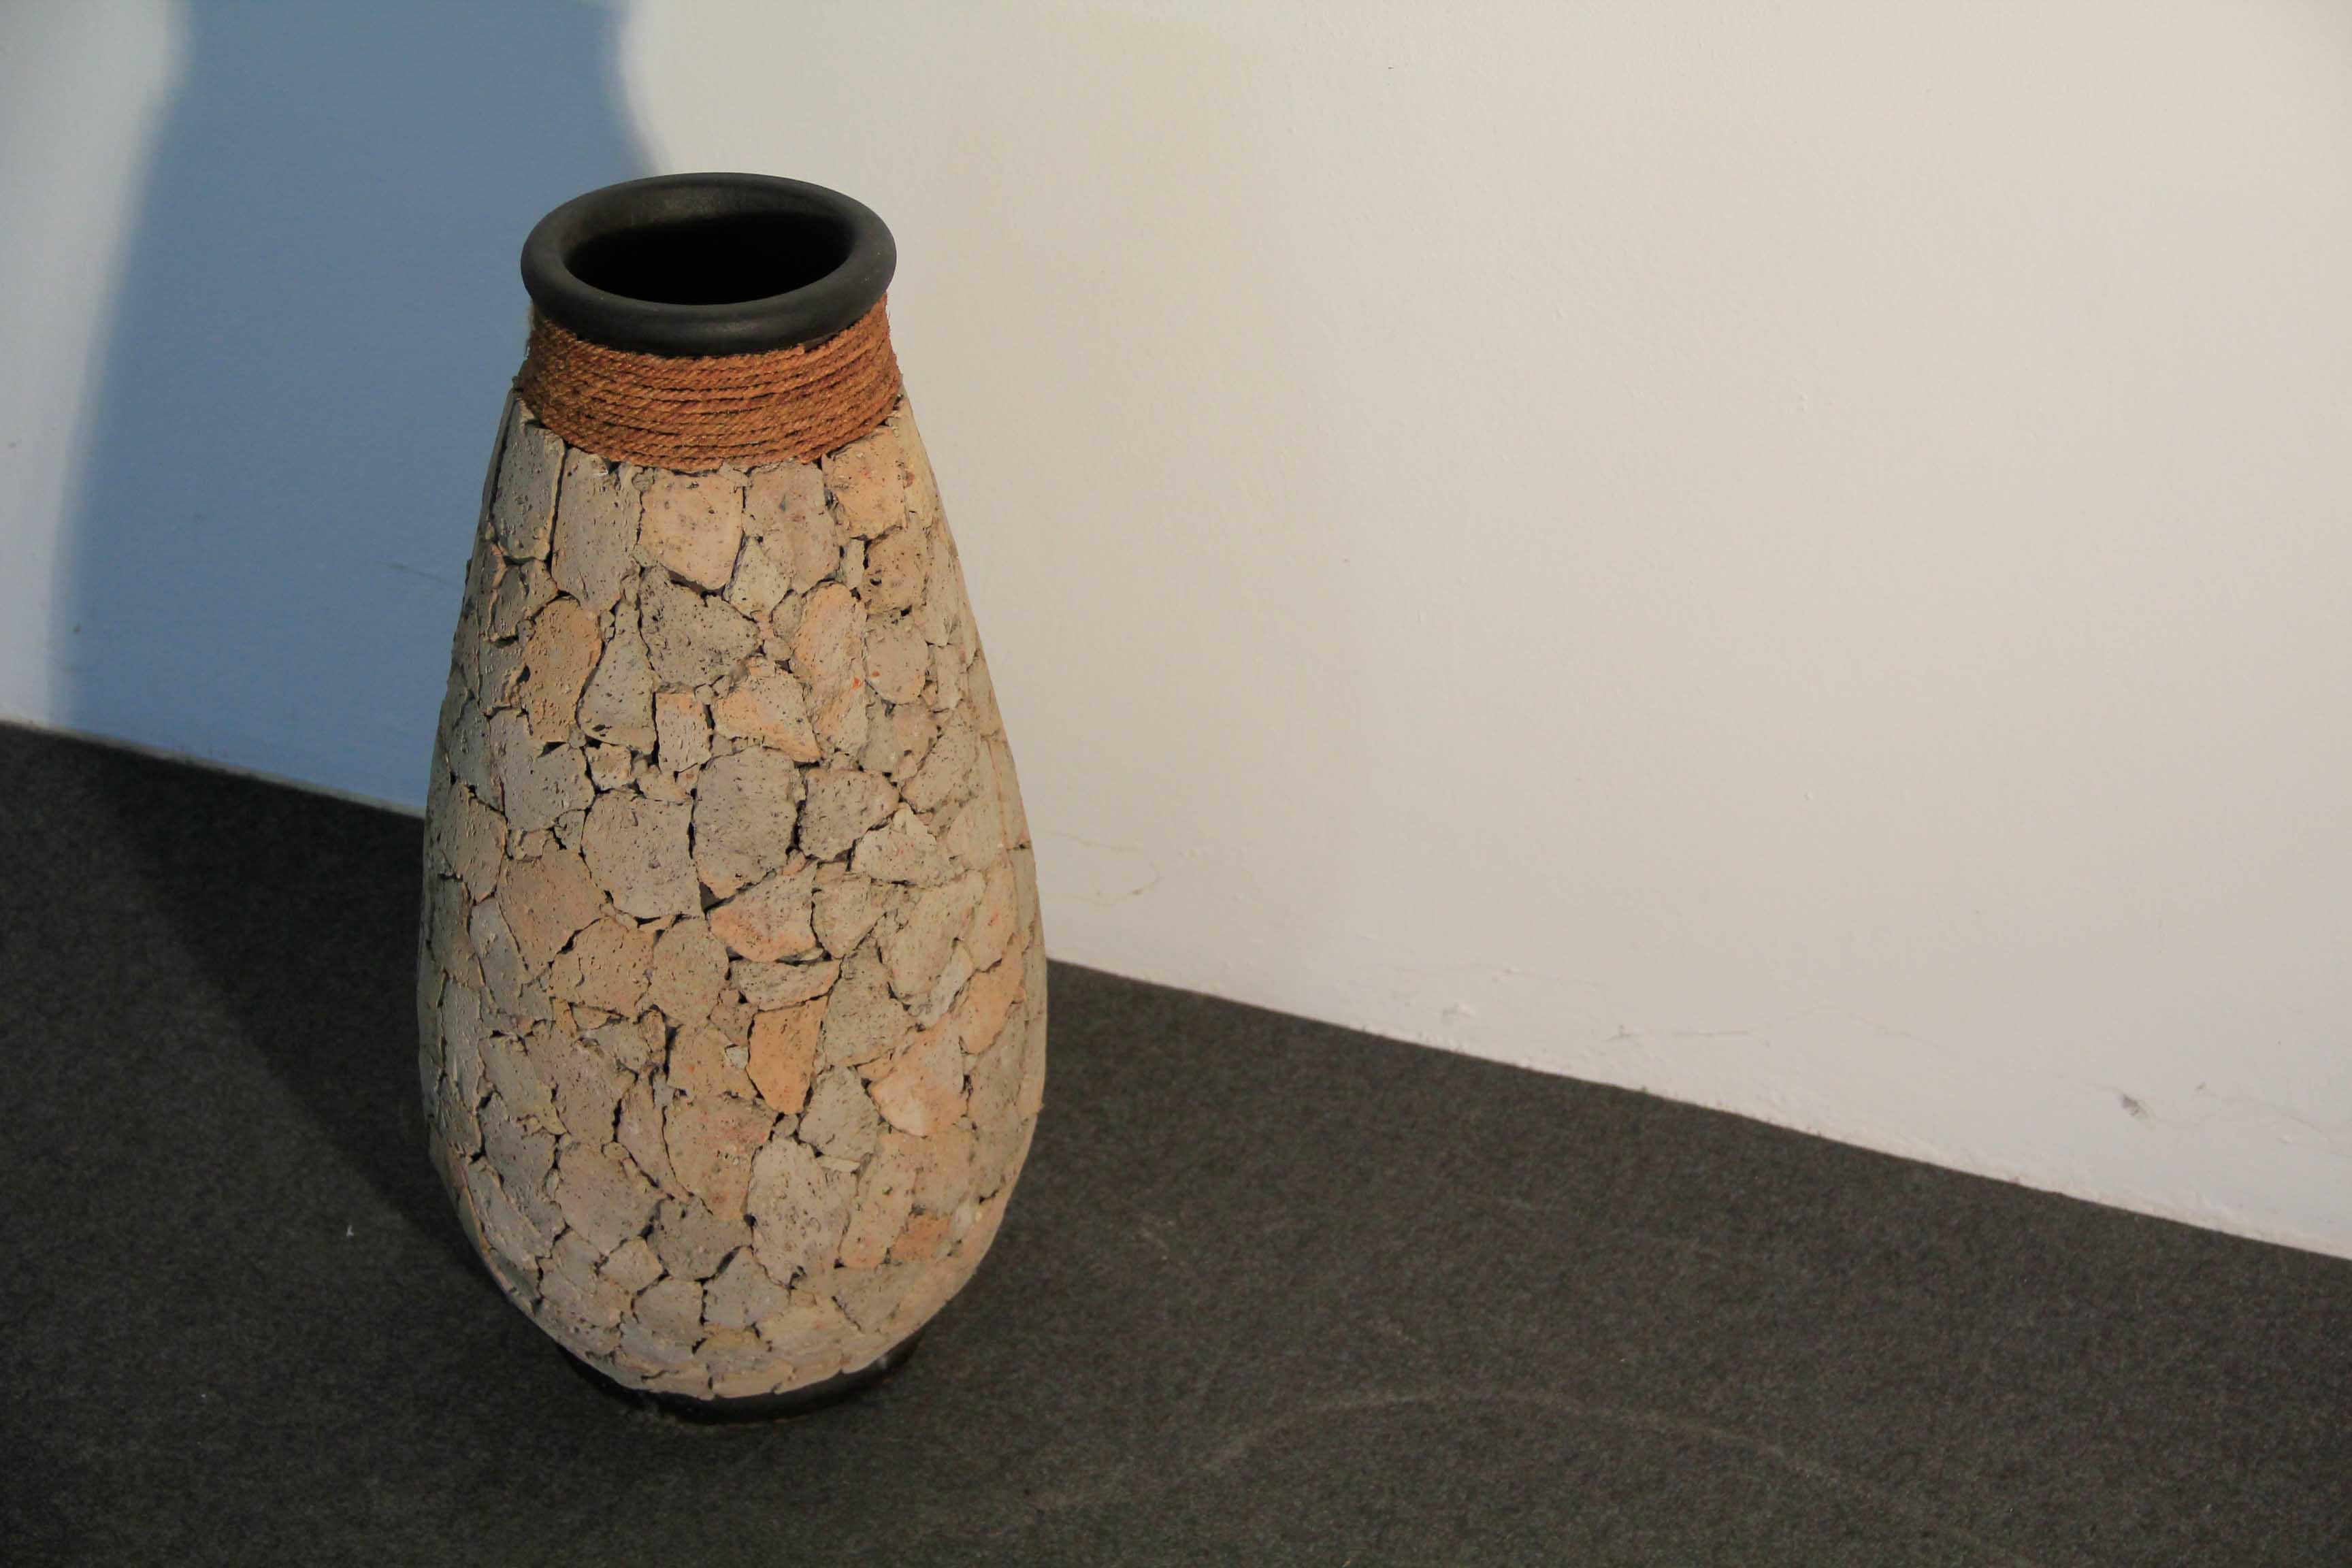 vaso in terracotta rivestito